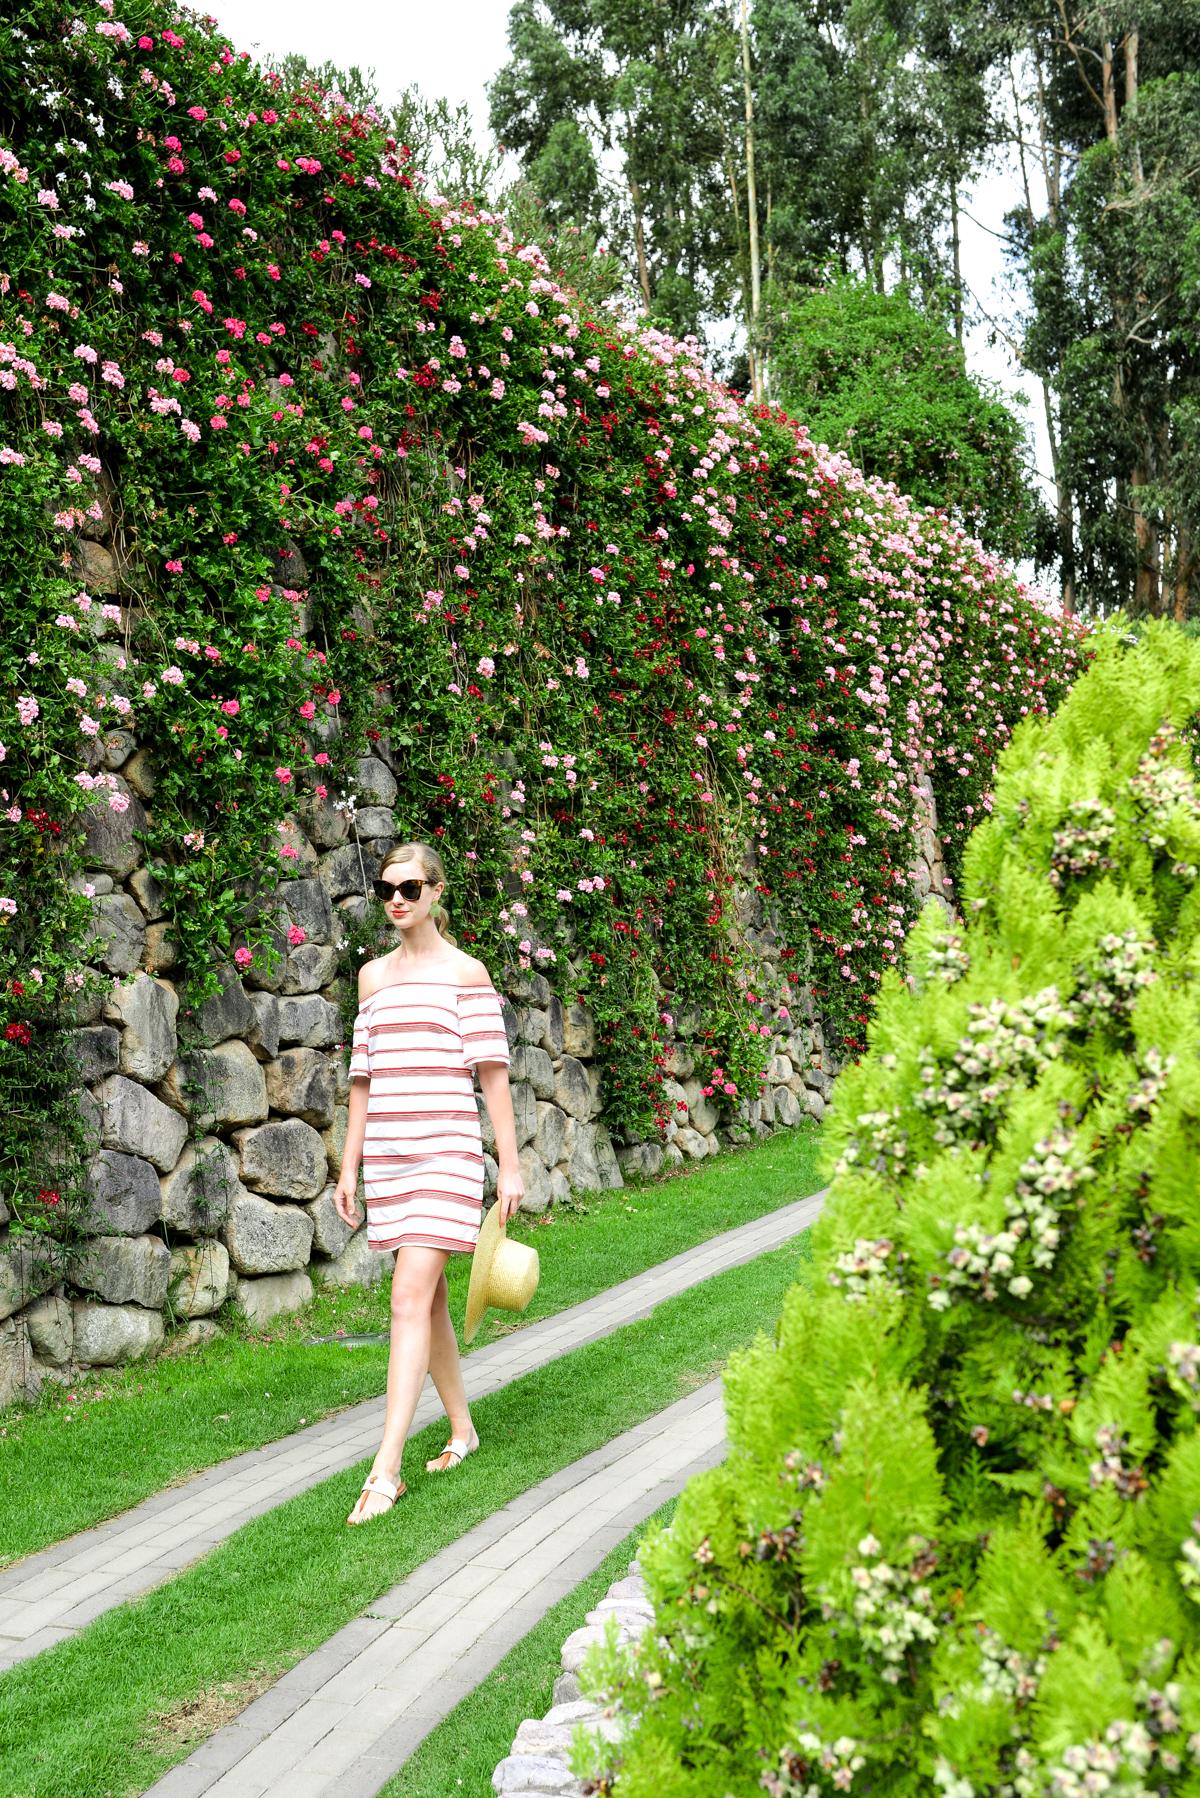 Stacie Flinner x Belmond Rio Sagrado Flowers-1